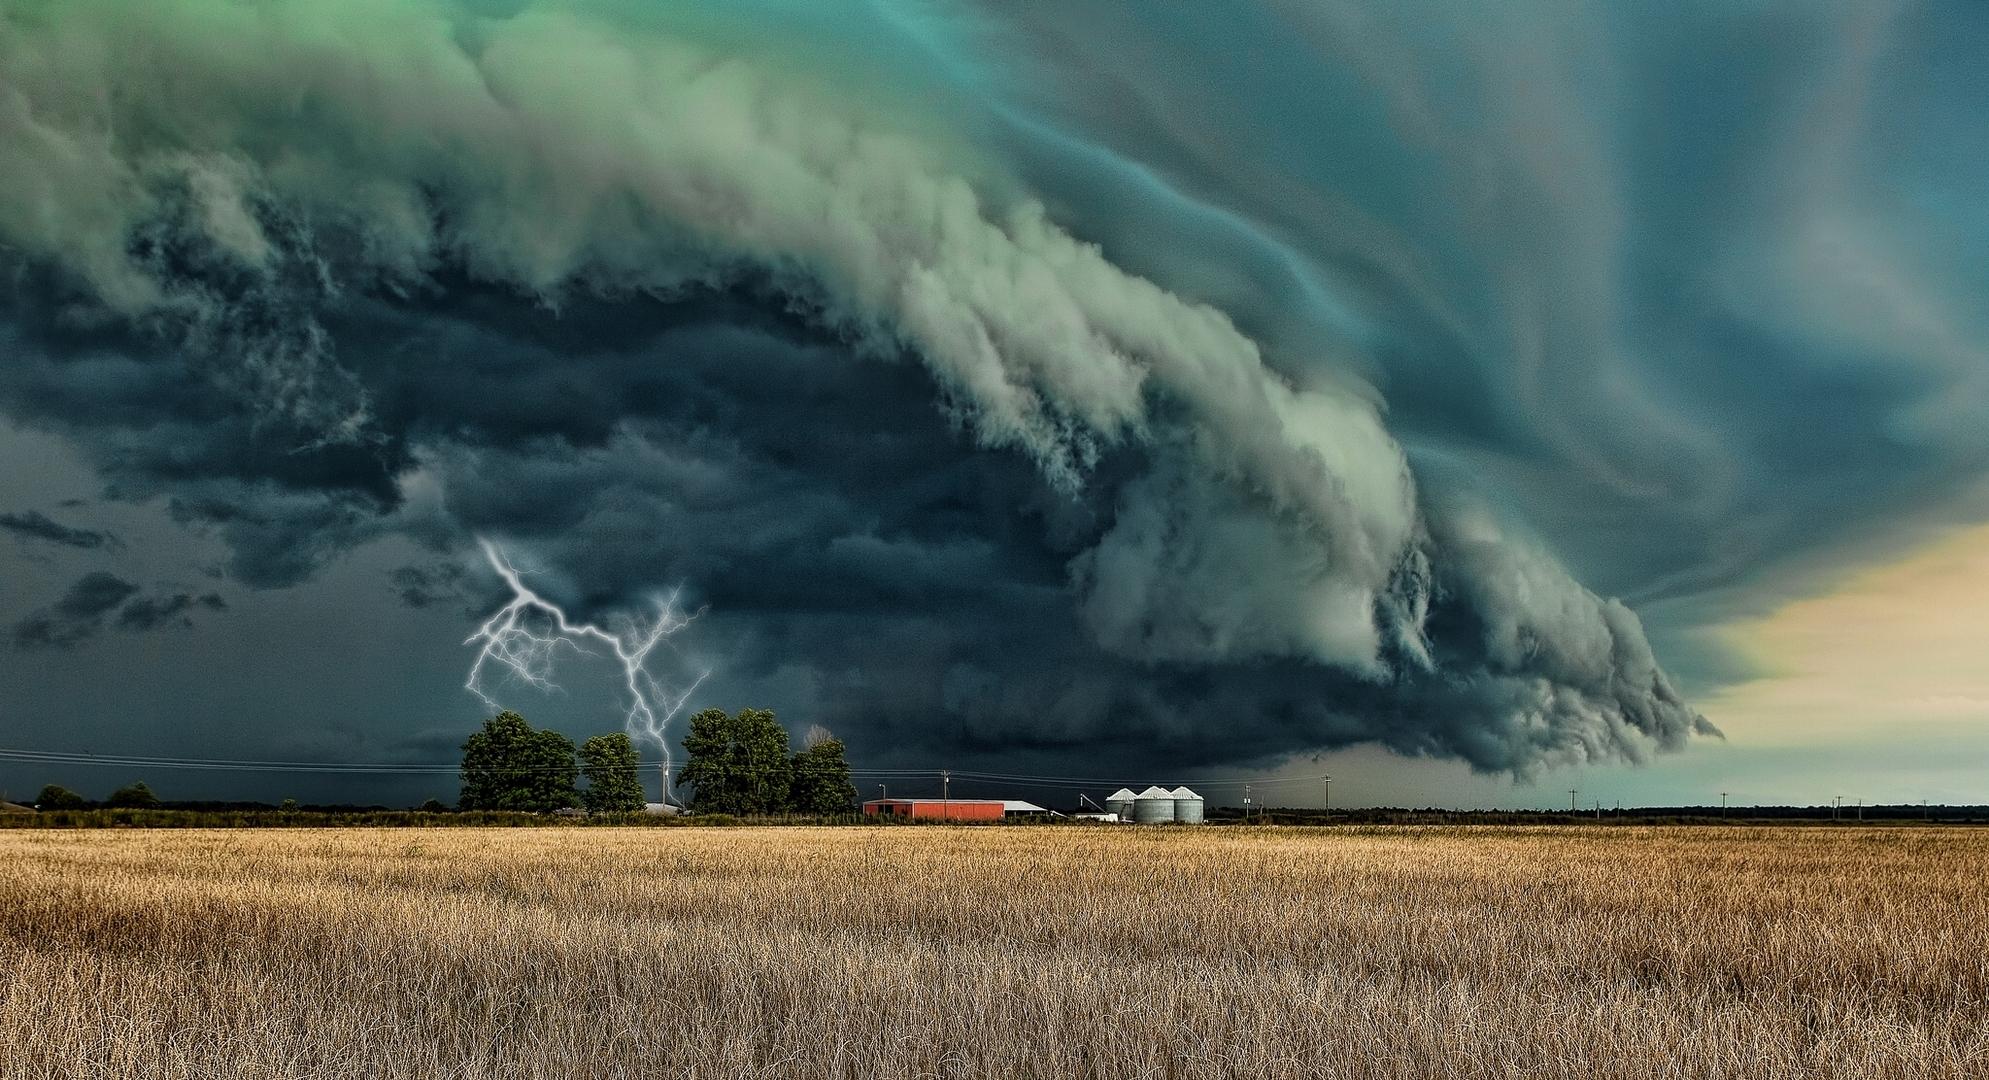 rain lightning farms farmland fields skies clouds wallpaper background 1989x1080